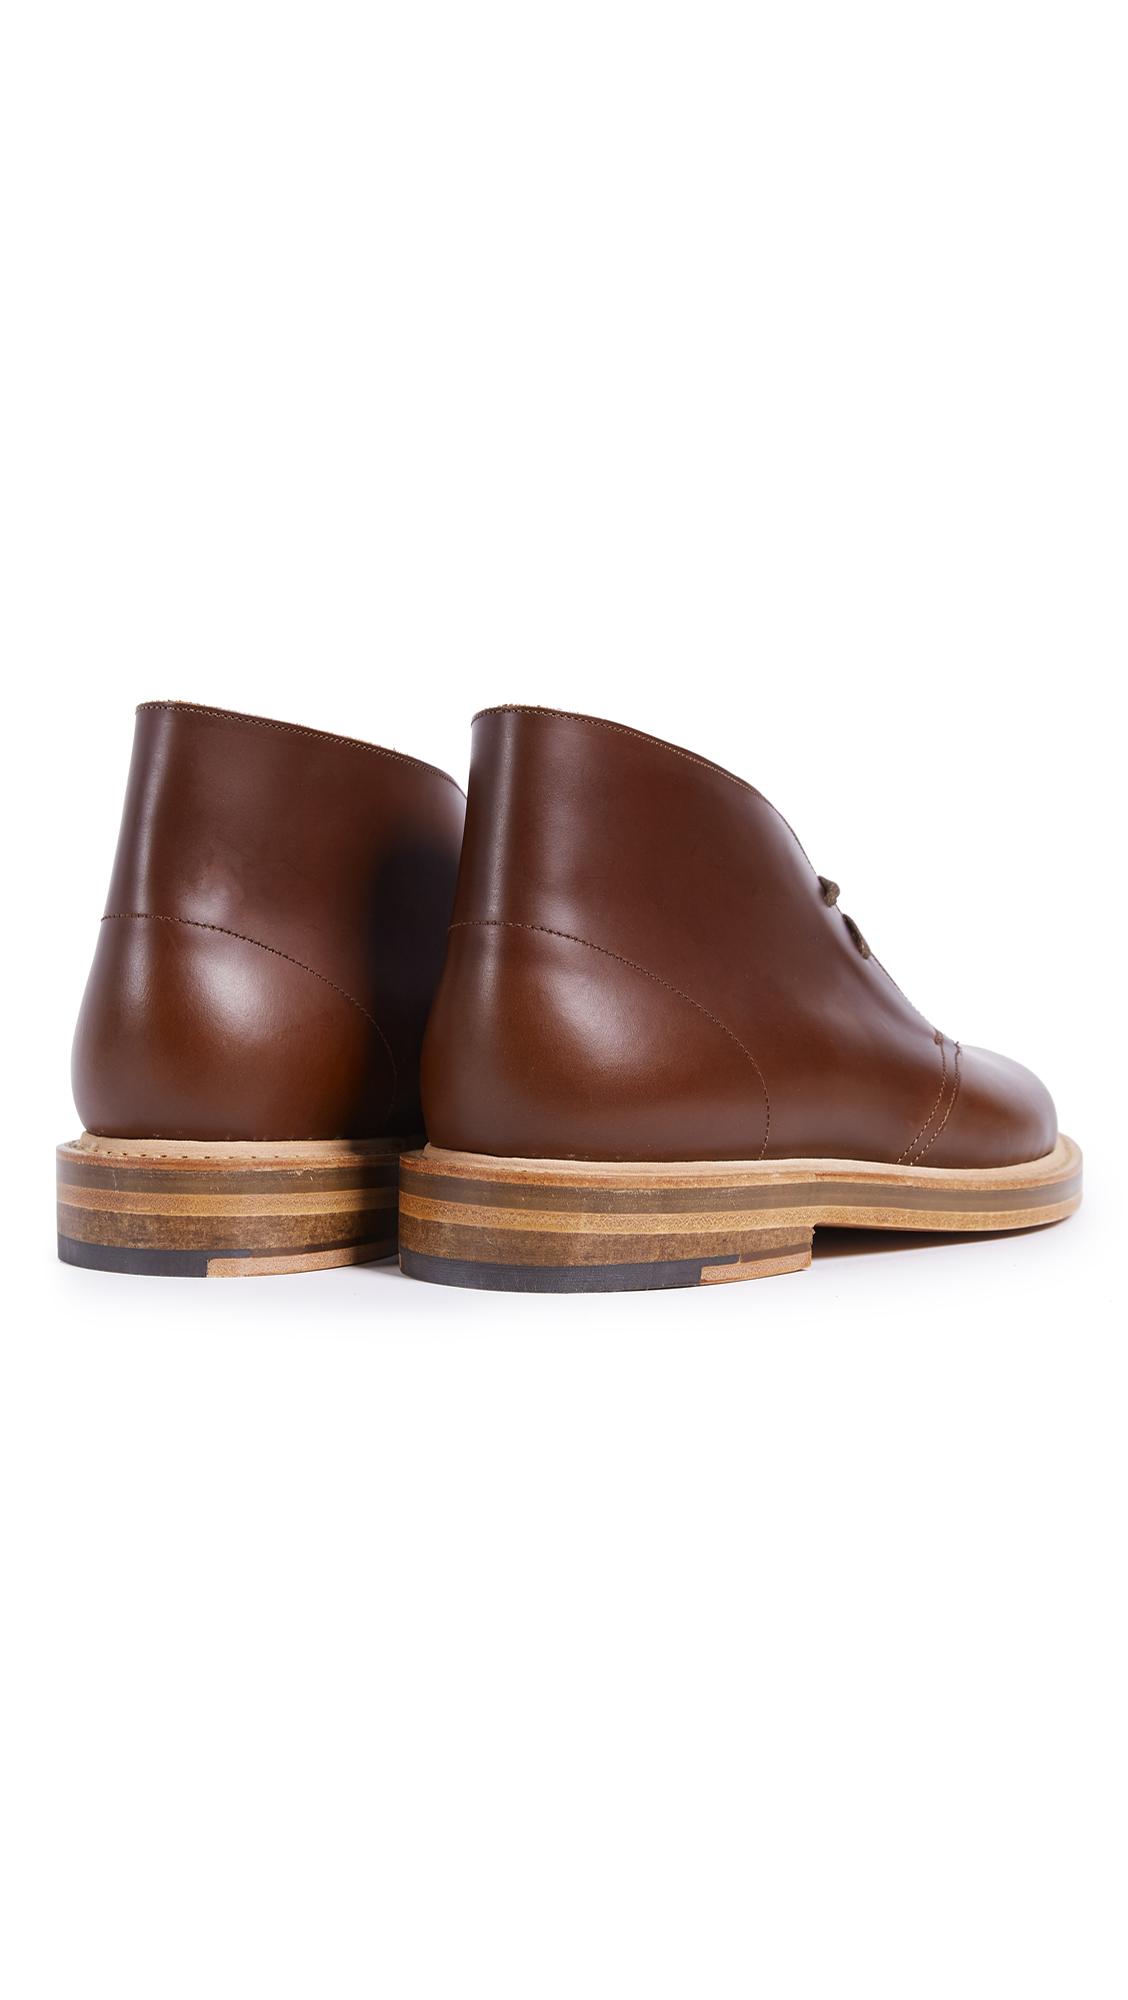 57b9b419e6e Clarks Desert Welt Leather Boots